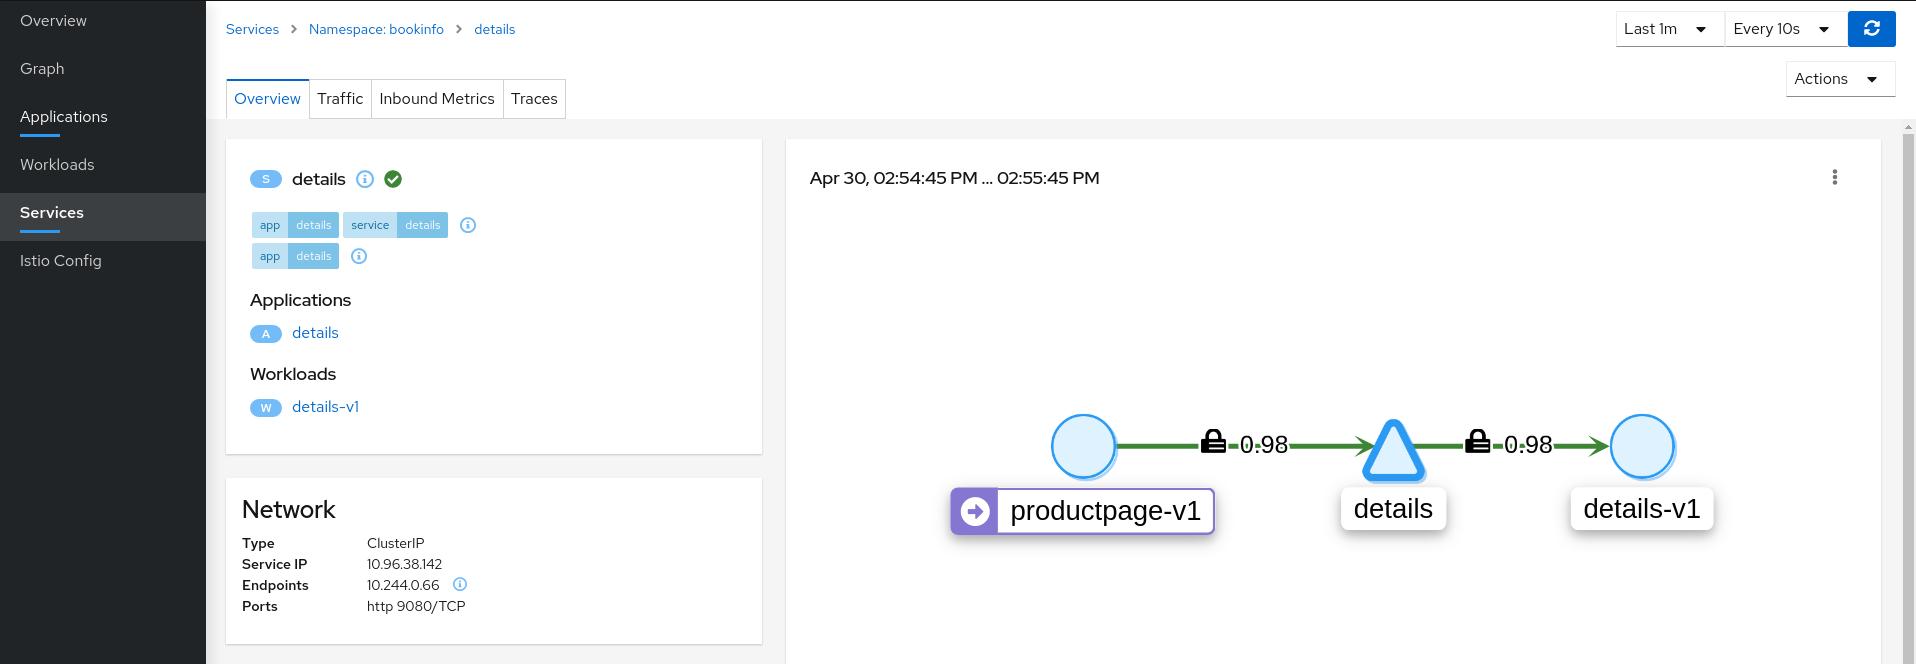 Service Details Showing Valid Configuration